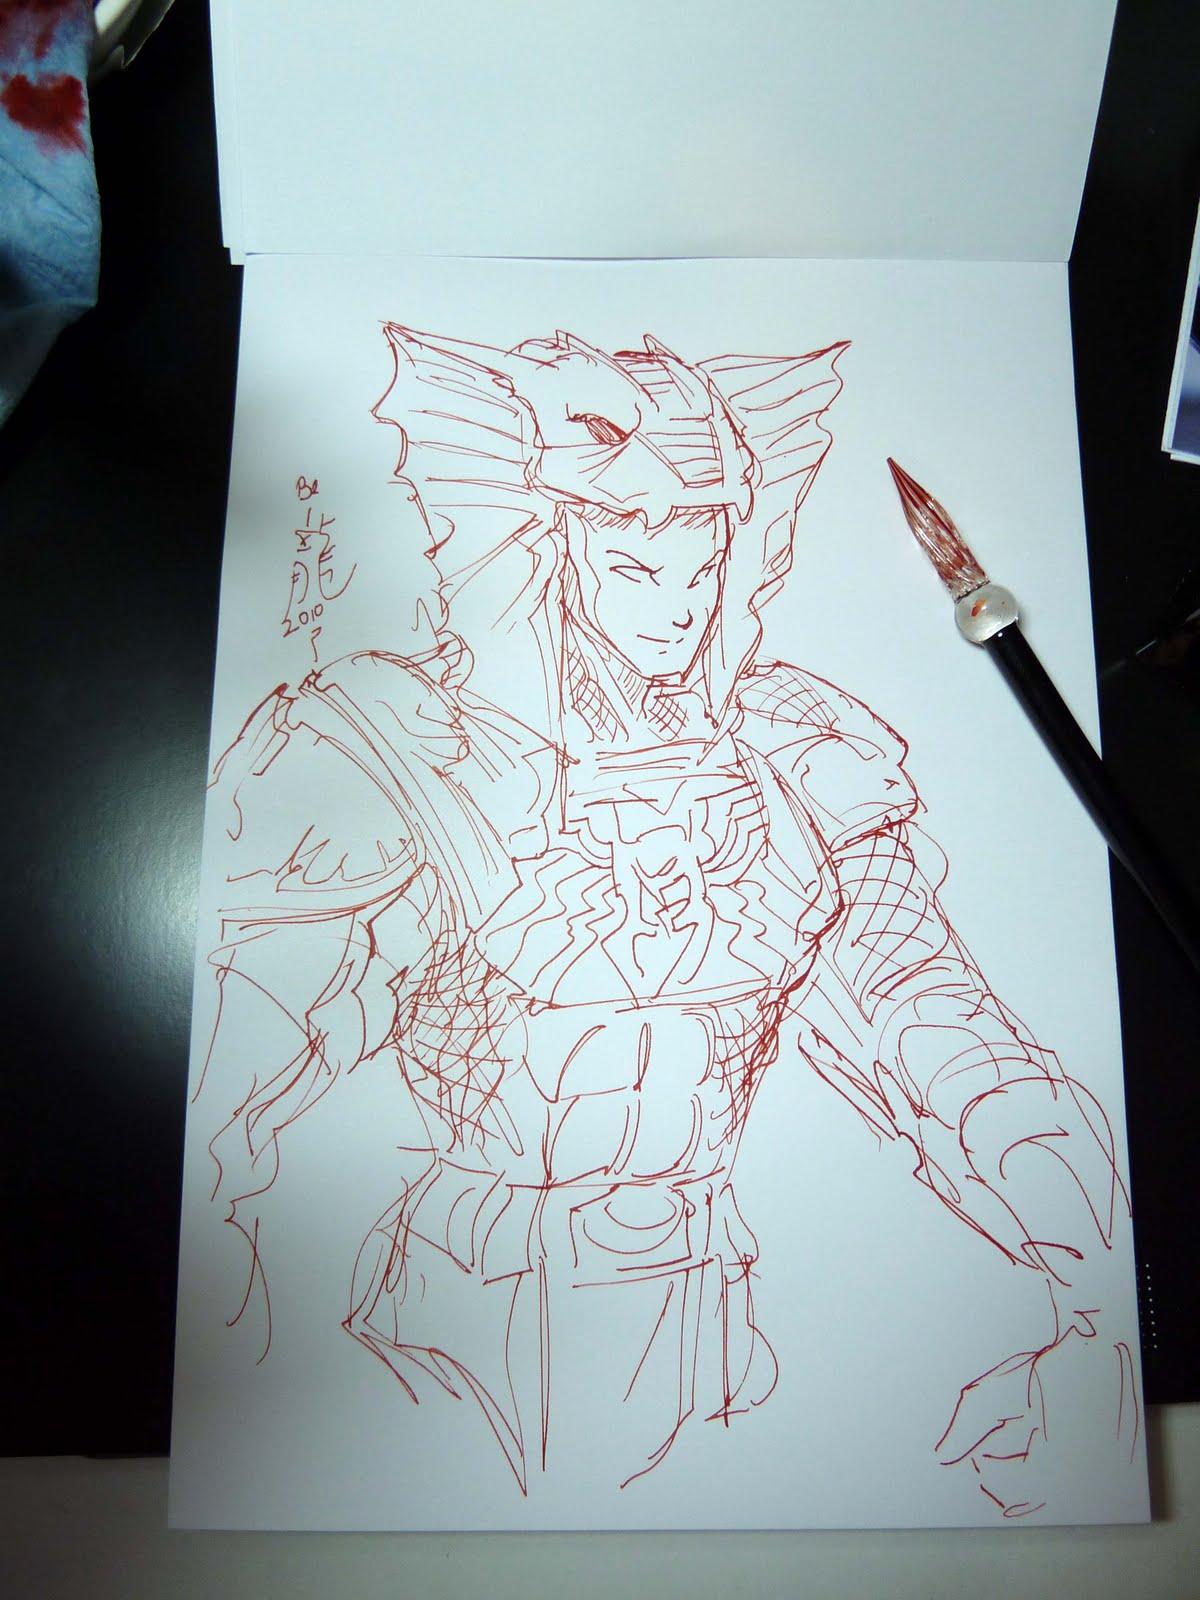 http://4.bp.blogspot.com/_idUARdOEJAk/TDbOm-3I3uI/AAAAAAAAHis/1XgI97b95sM/s1600/J+Herbin+1670+test+doodle+on+Clairefontaine+Triomphe+paper+b.jpg